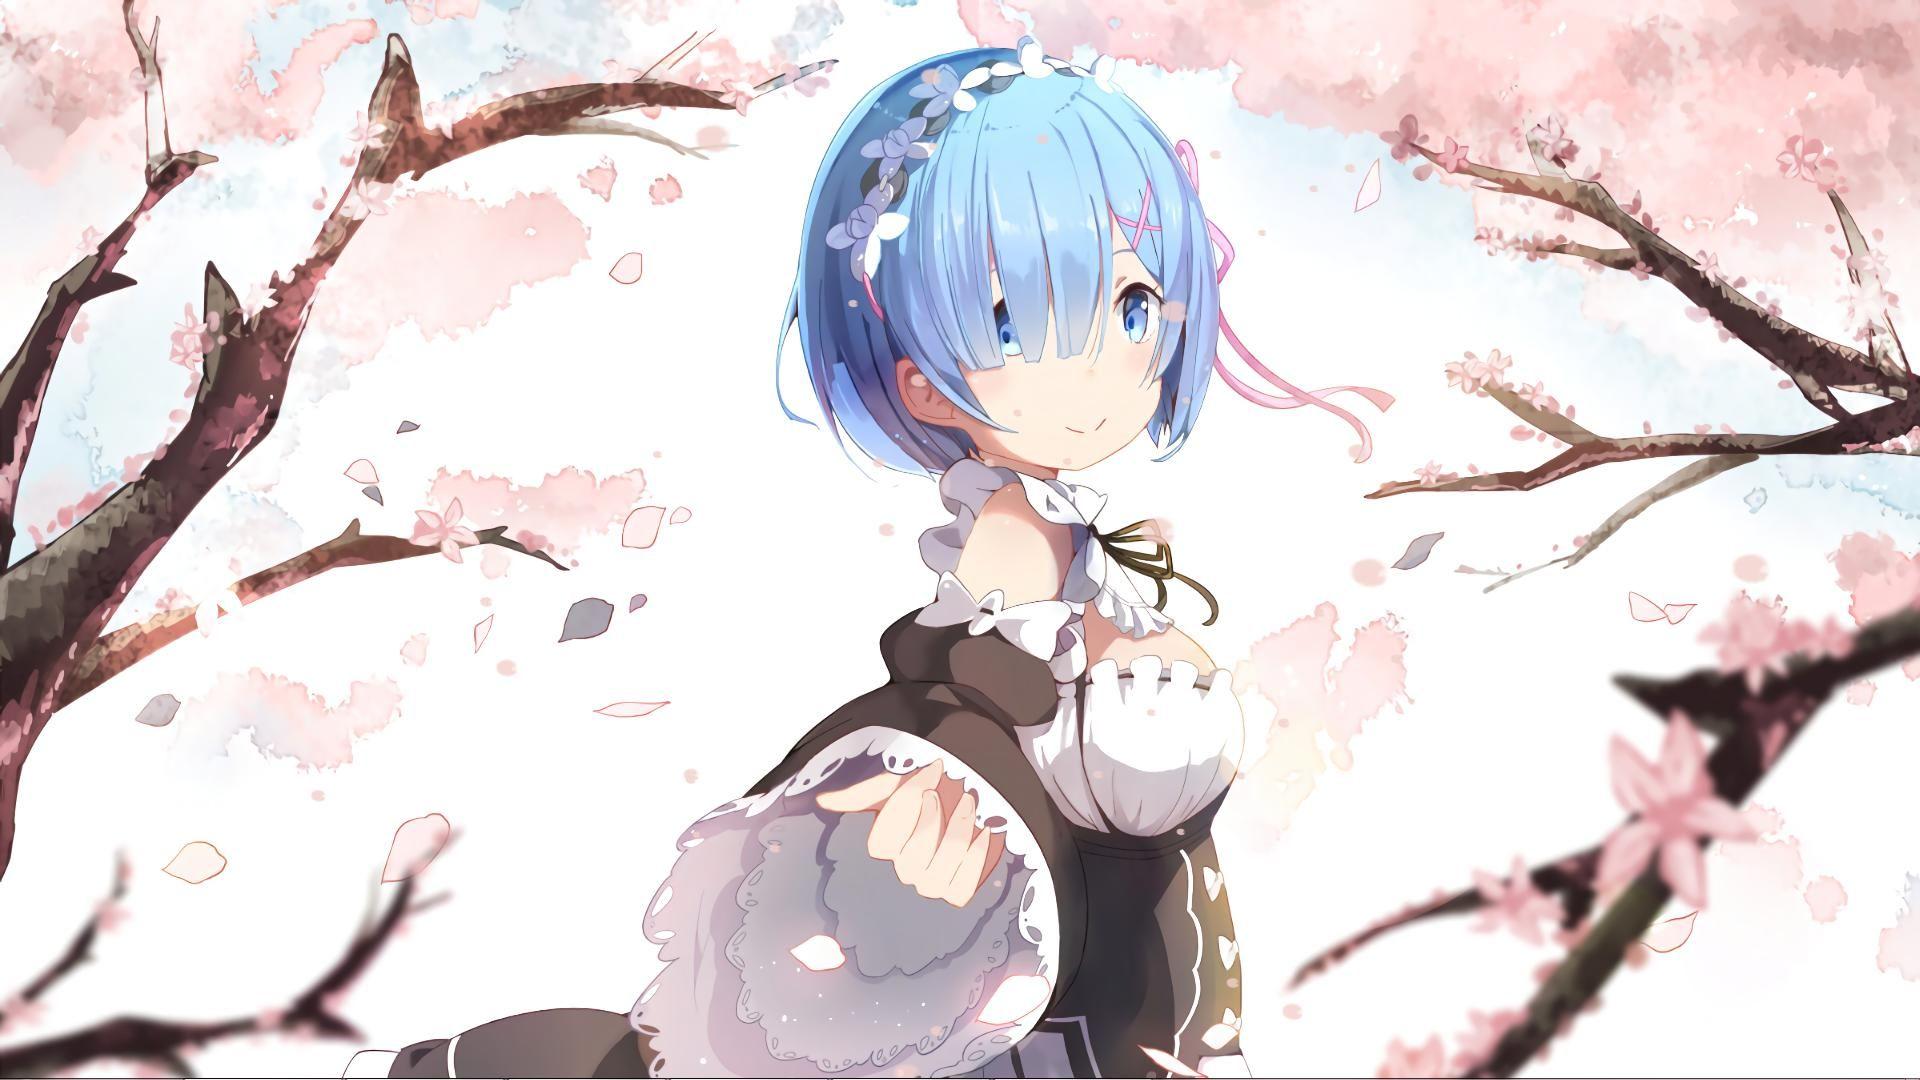 Rem Rezero Wallpaper For Wallpaper Engine